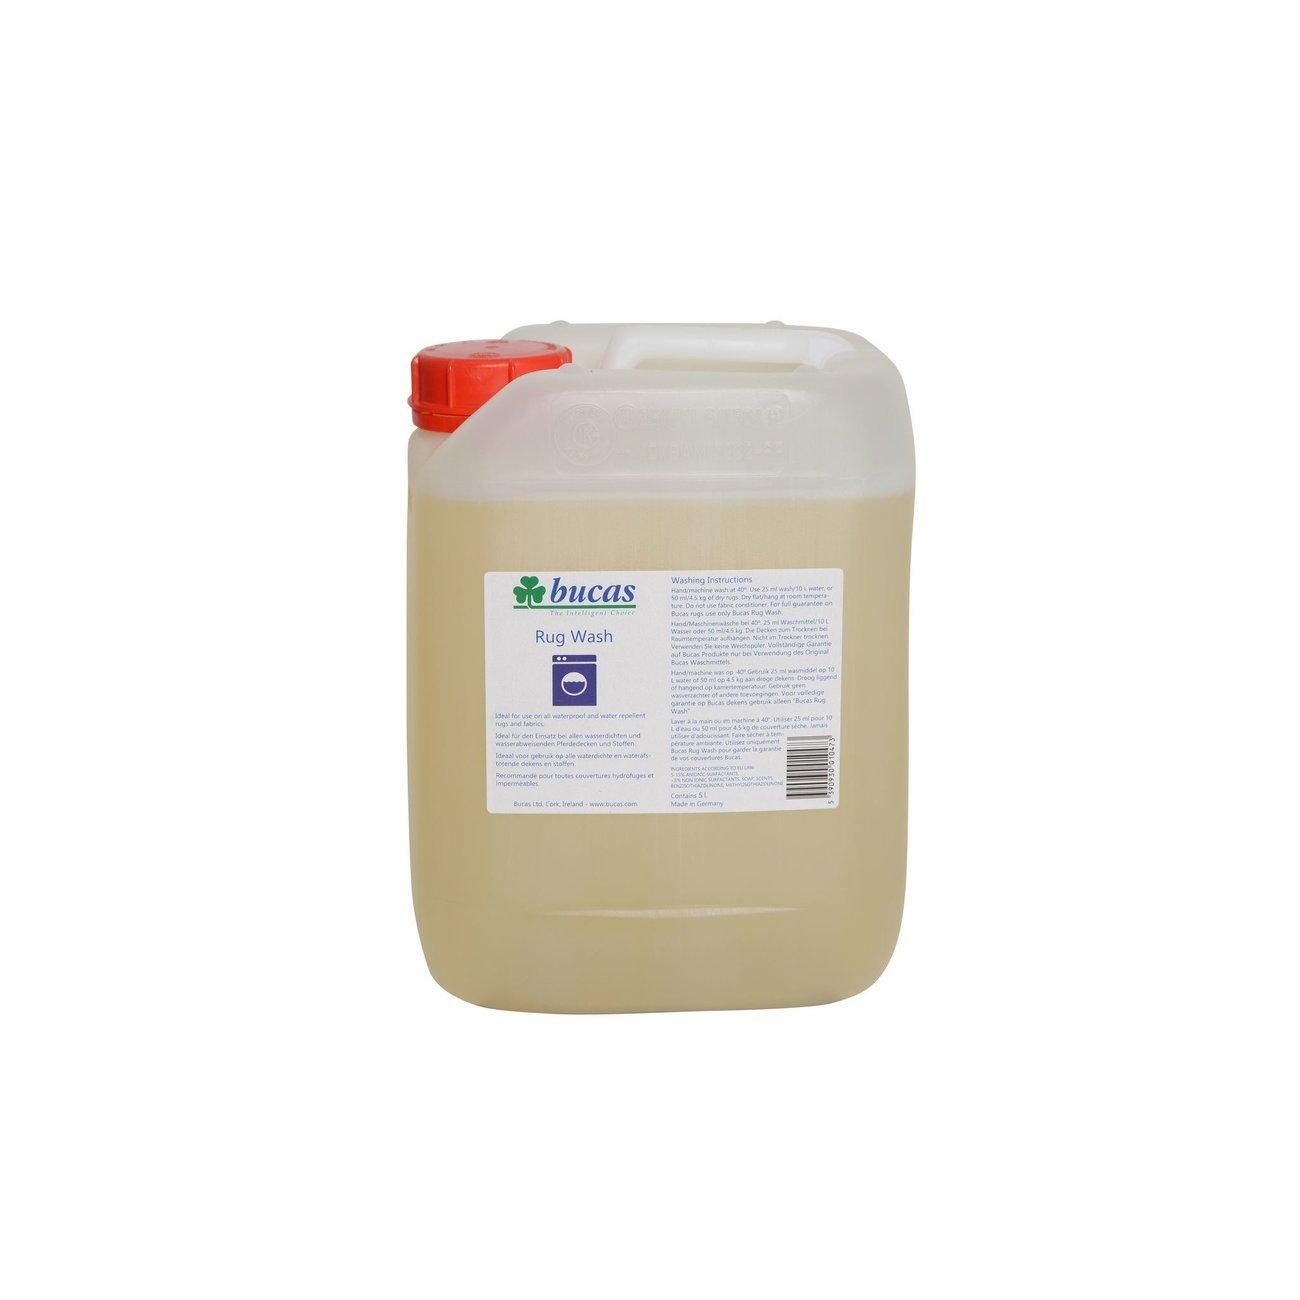 Bucas Deckenwaschmittel, 5 Liter